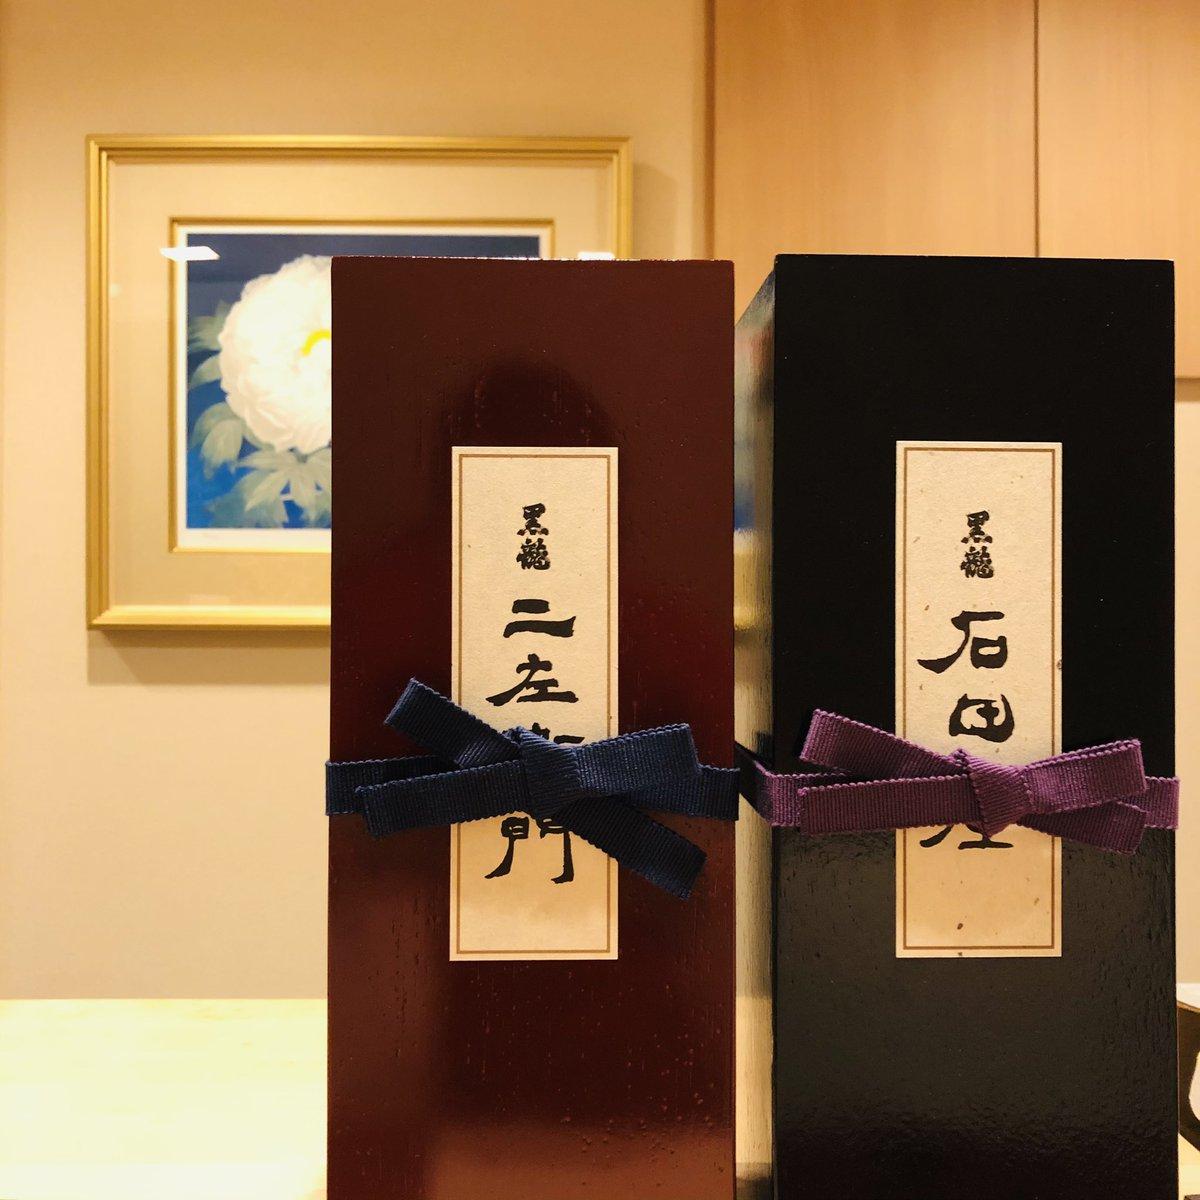 test ツイッターメディア - 黒龍『仁左衛門』『石田屋』  今年も入手しました🎵  最高峰の日本酒達🍶  #グルメ好きな人と繋がりたい #料理好きな人と繋がりたい #グルメ https://t.co/DeIm2kSsiZ